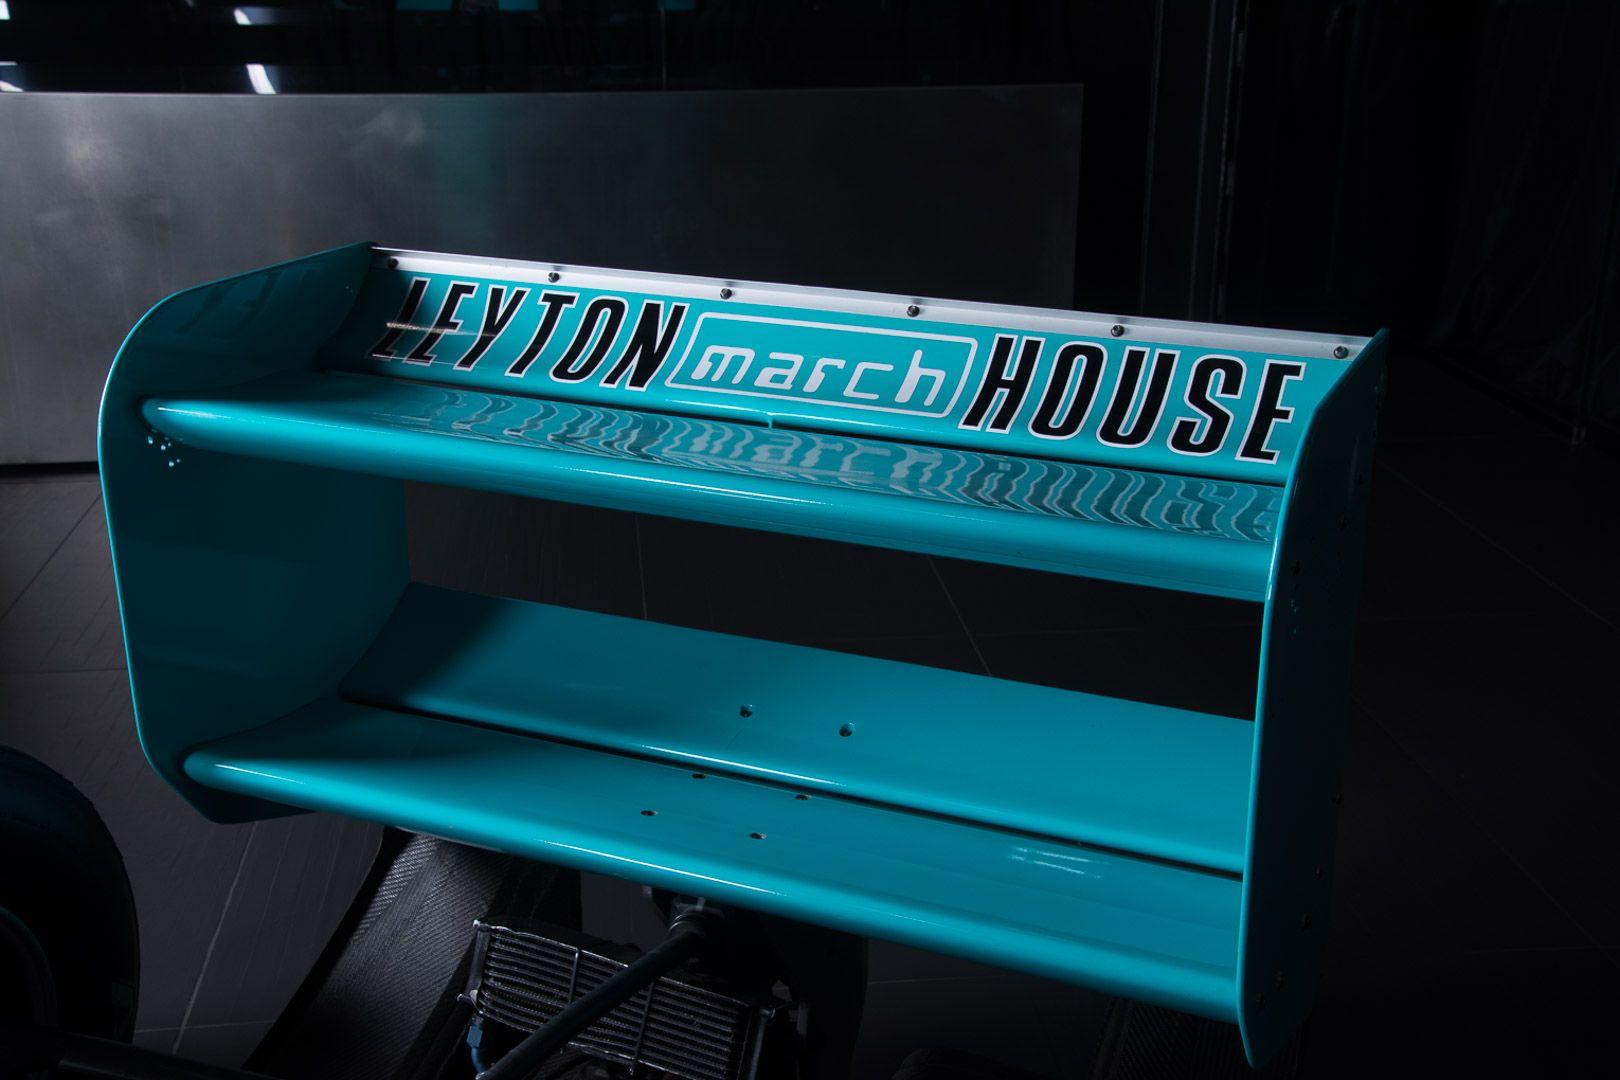 1987 March Leyton House F1 18016